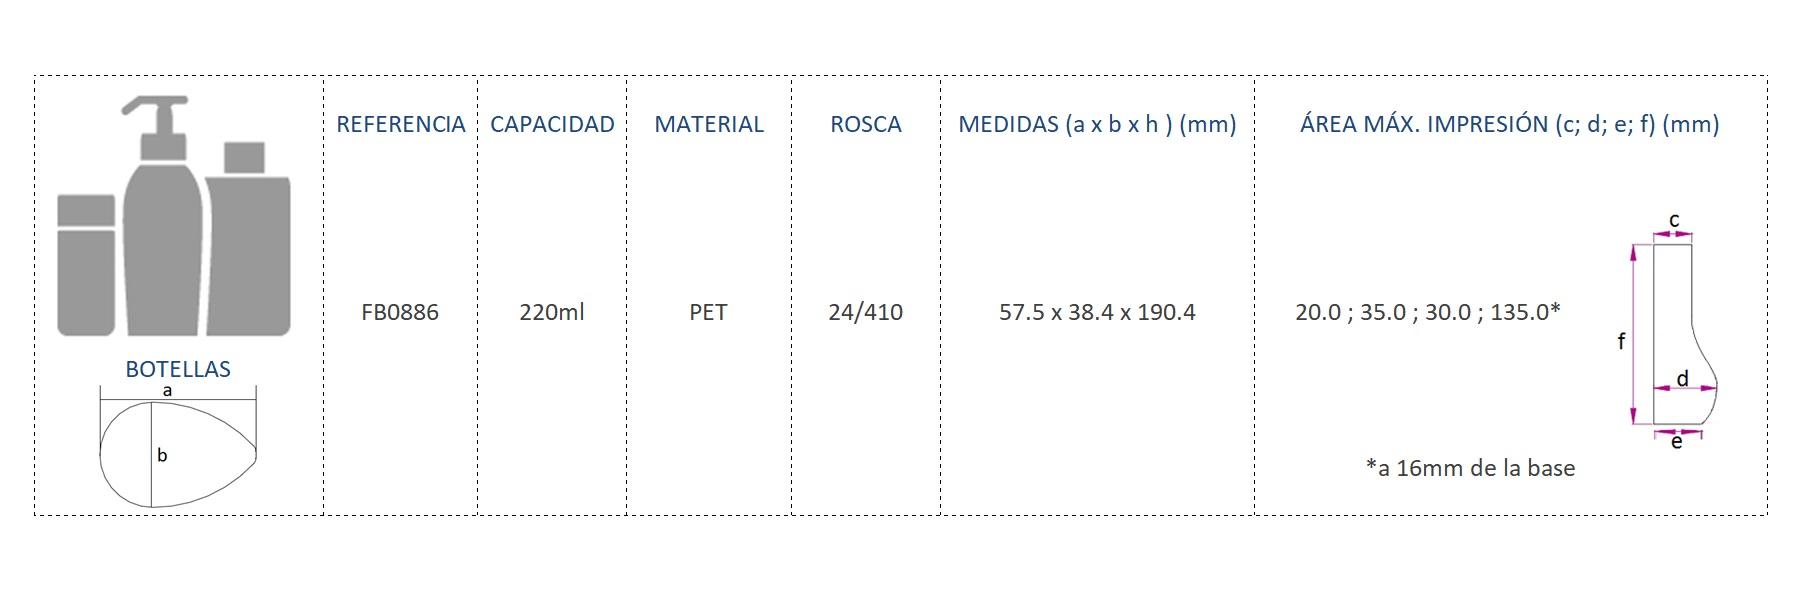 Cuadro de materiales botella FB0886